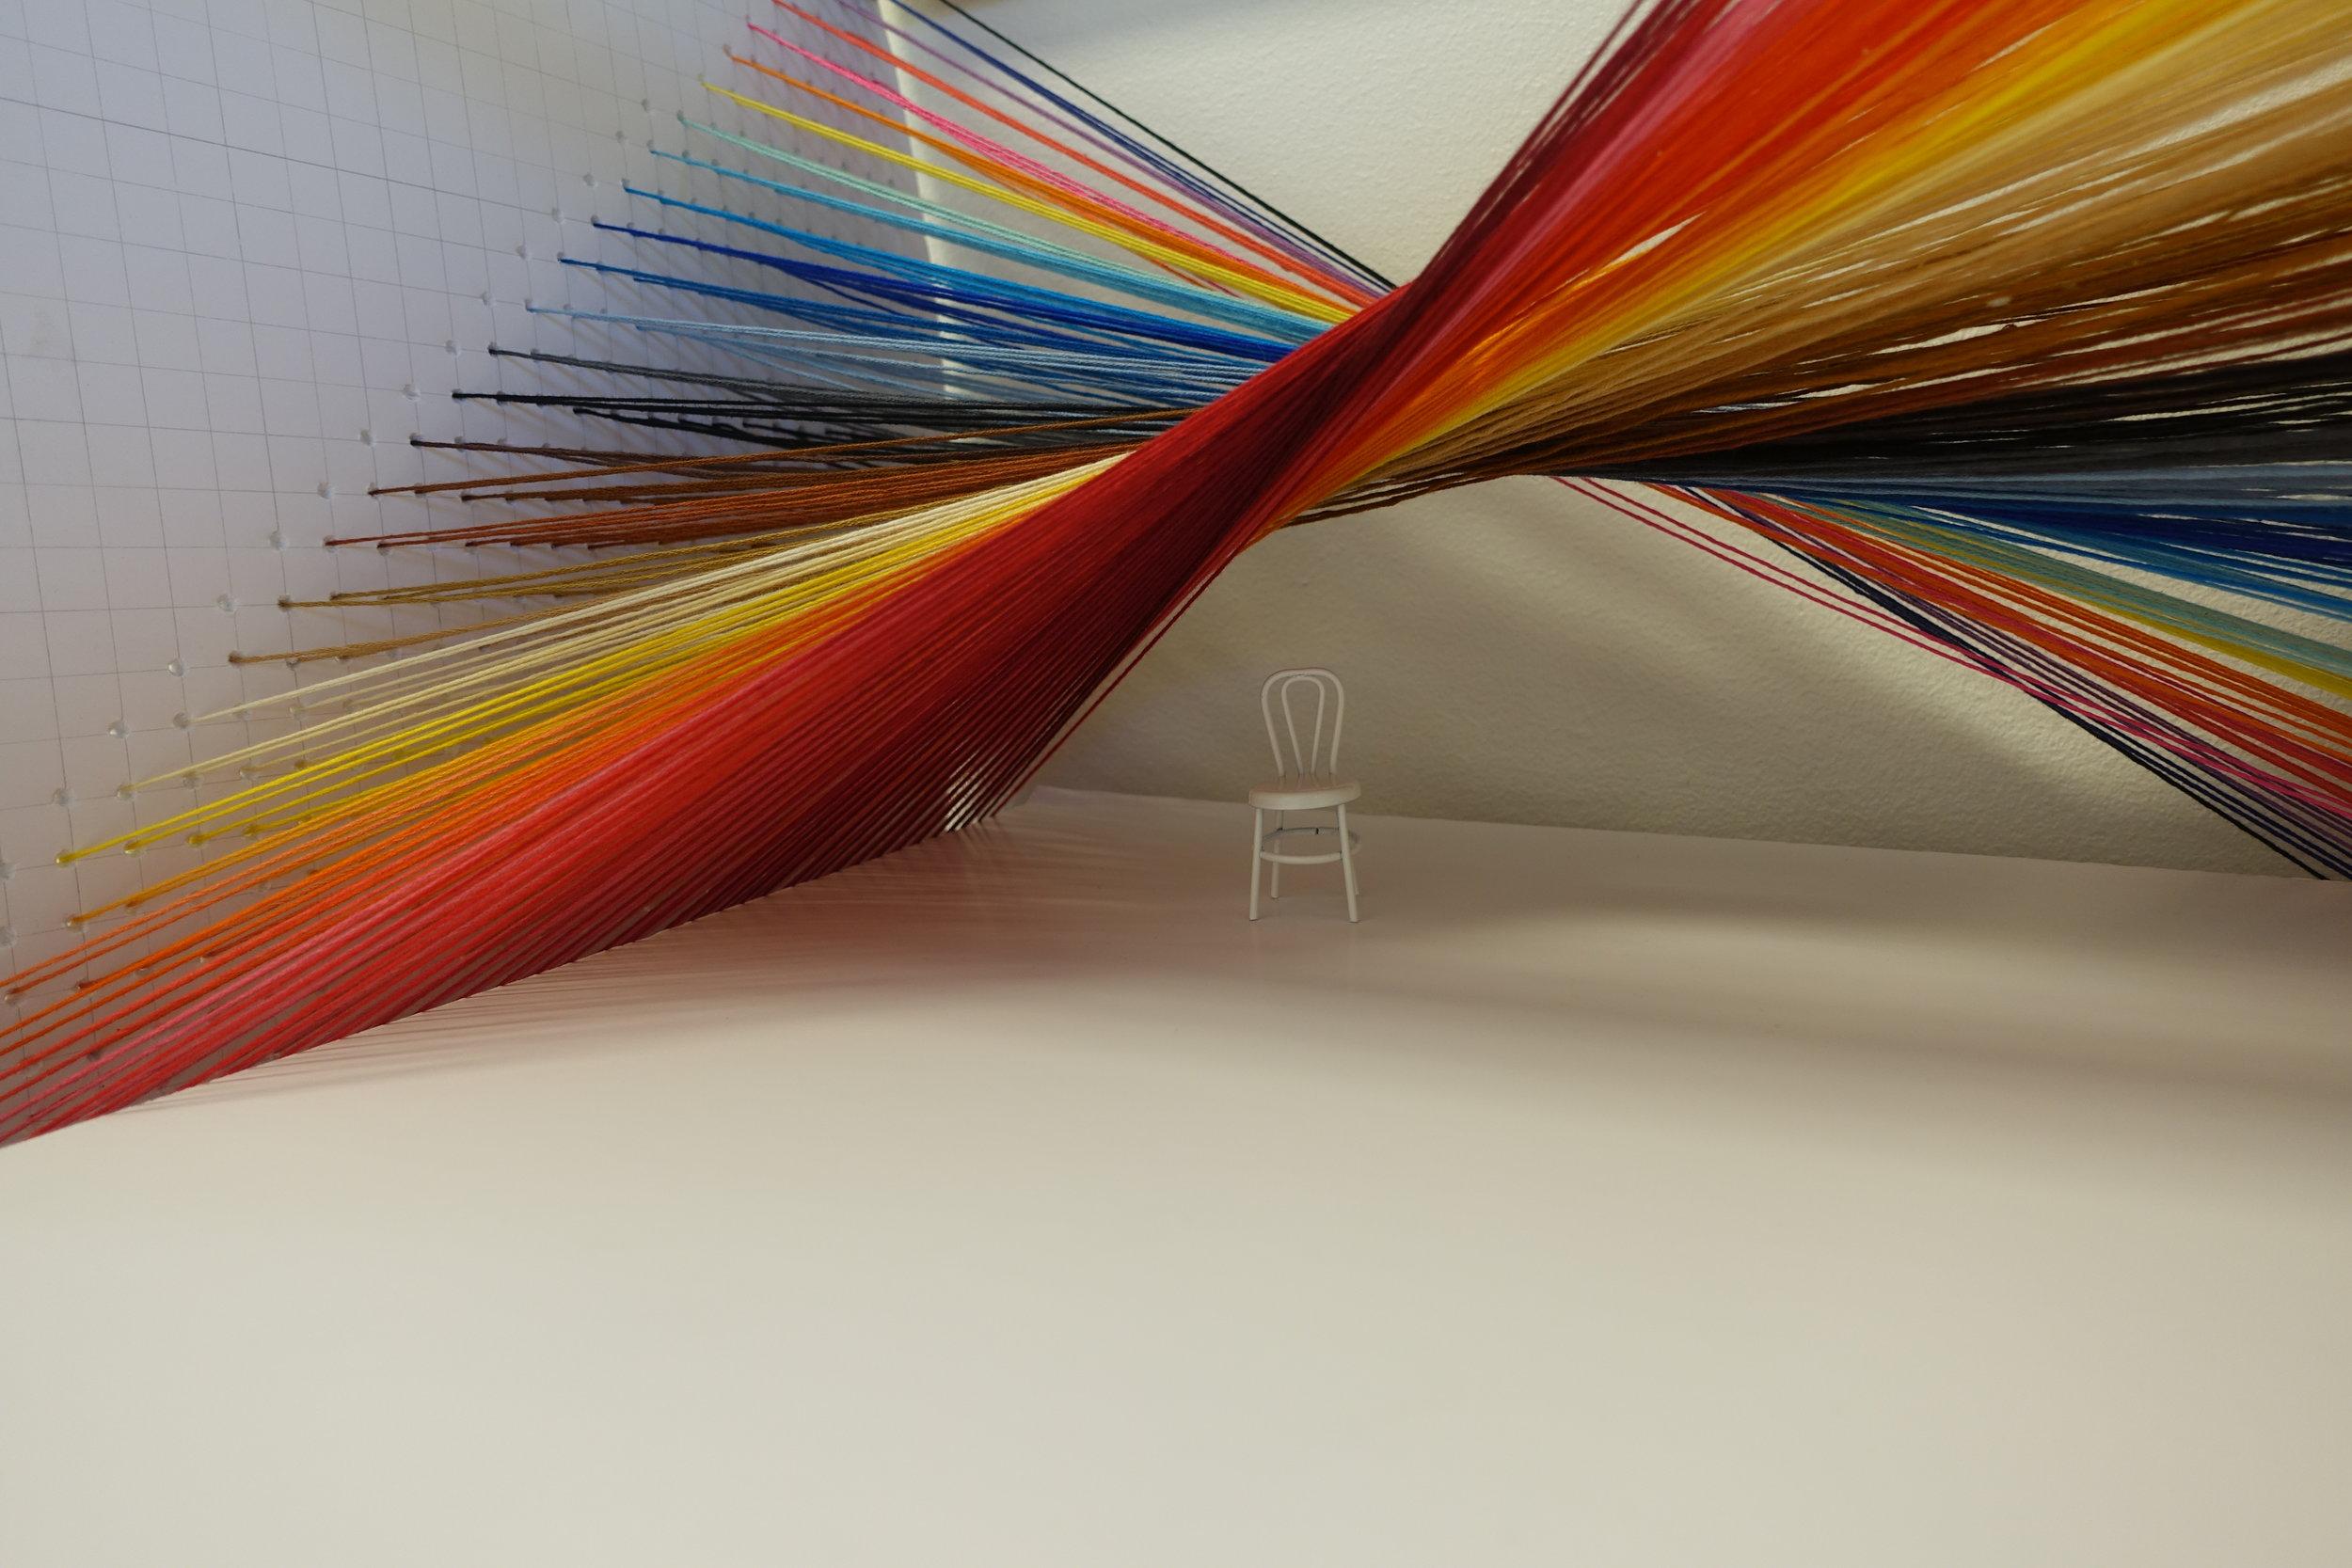 Color transitions _ Mockup Model by VG Studio